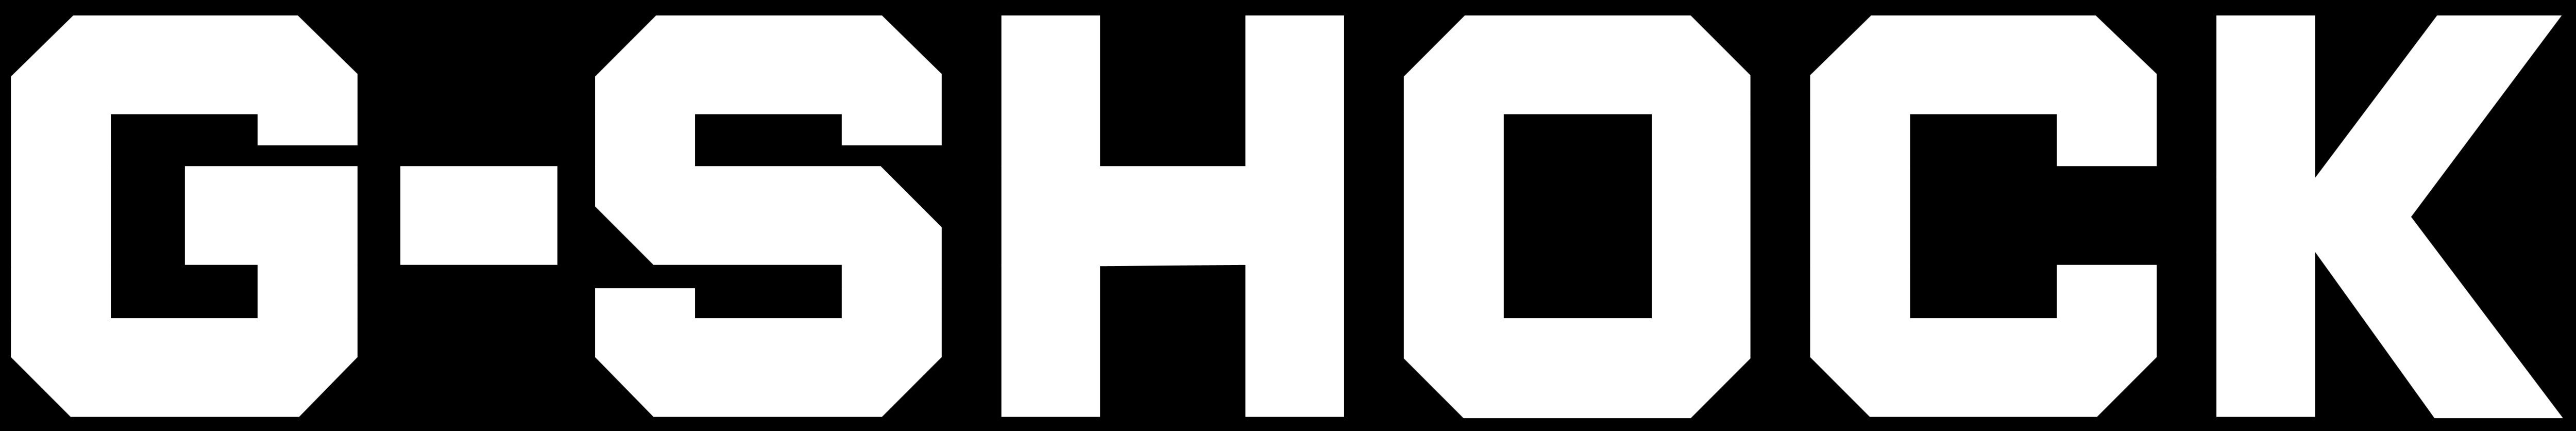 g shock logos download oakley logo pics oakley logo images